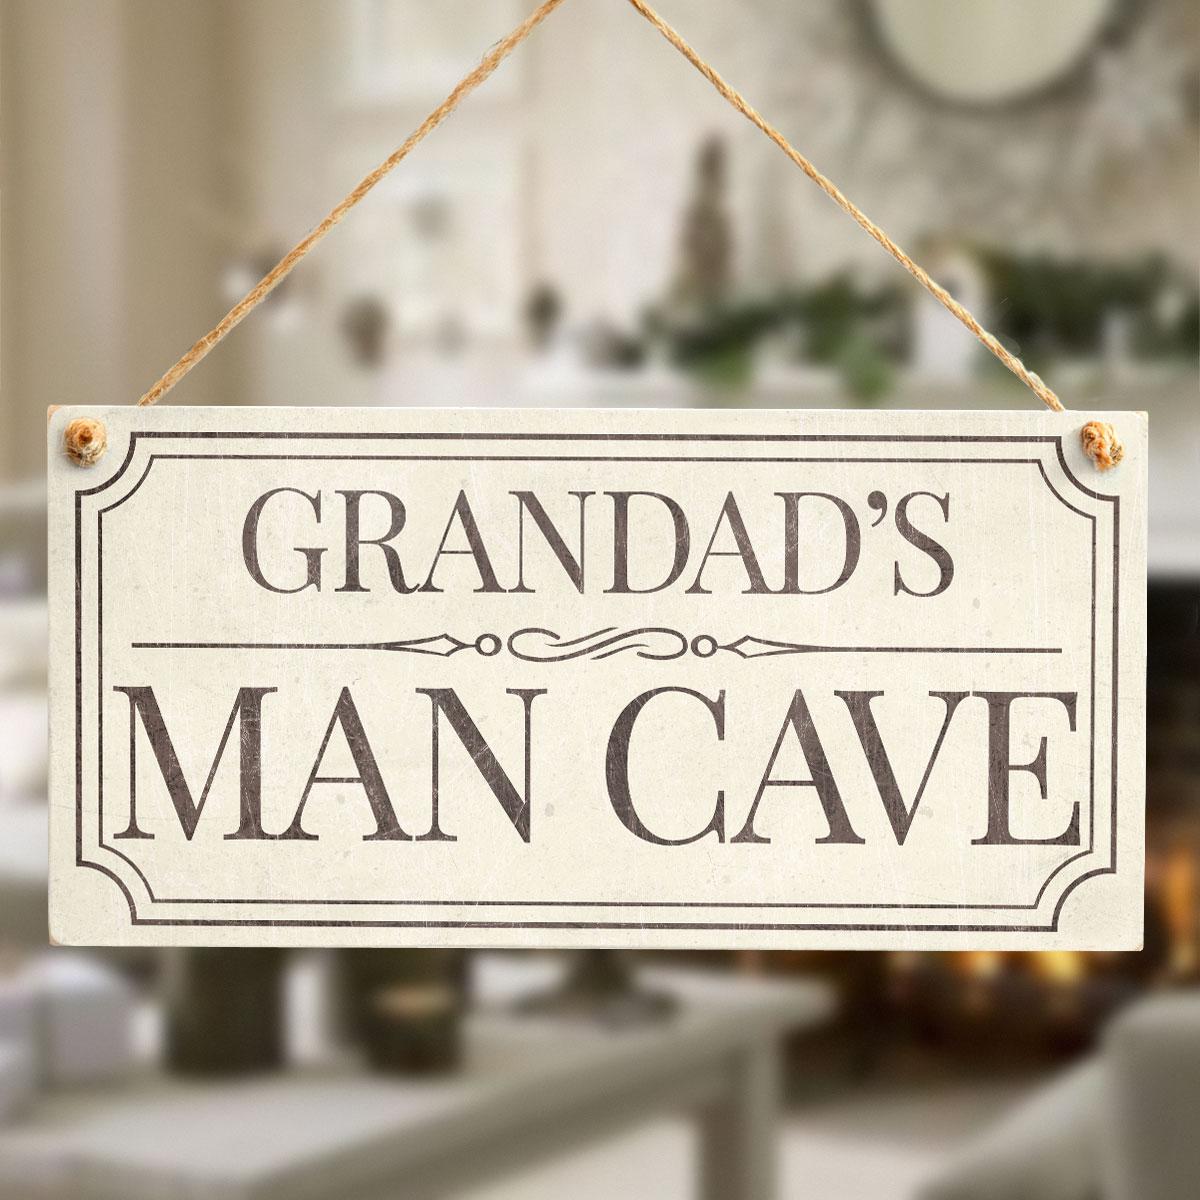 Handmade Man Cave Signs : Grandad s man cave fun traditional design style handmade